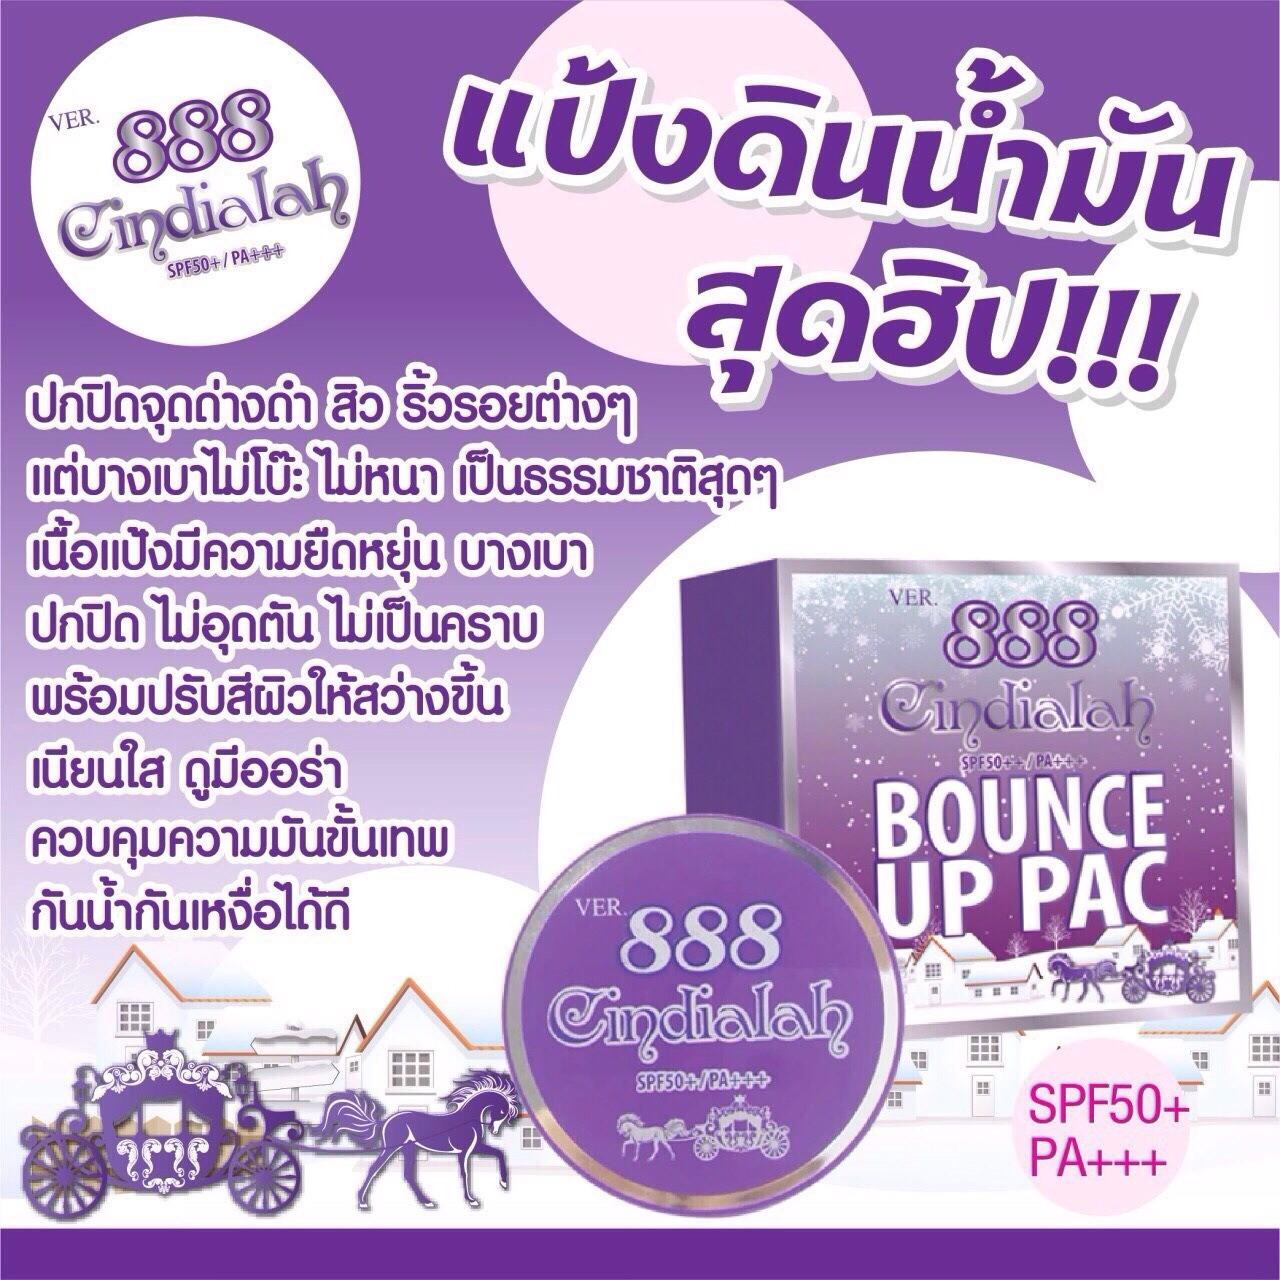 Ver.888 Cindialah Bounce Up Pac SPF50+/PA+++ แป้งดินน้ำมัน กันน้ำ เนียน เด้ง ตลอดวัน